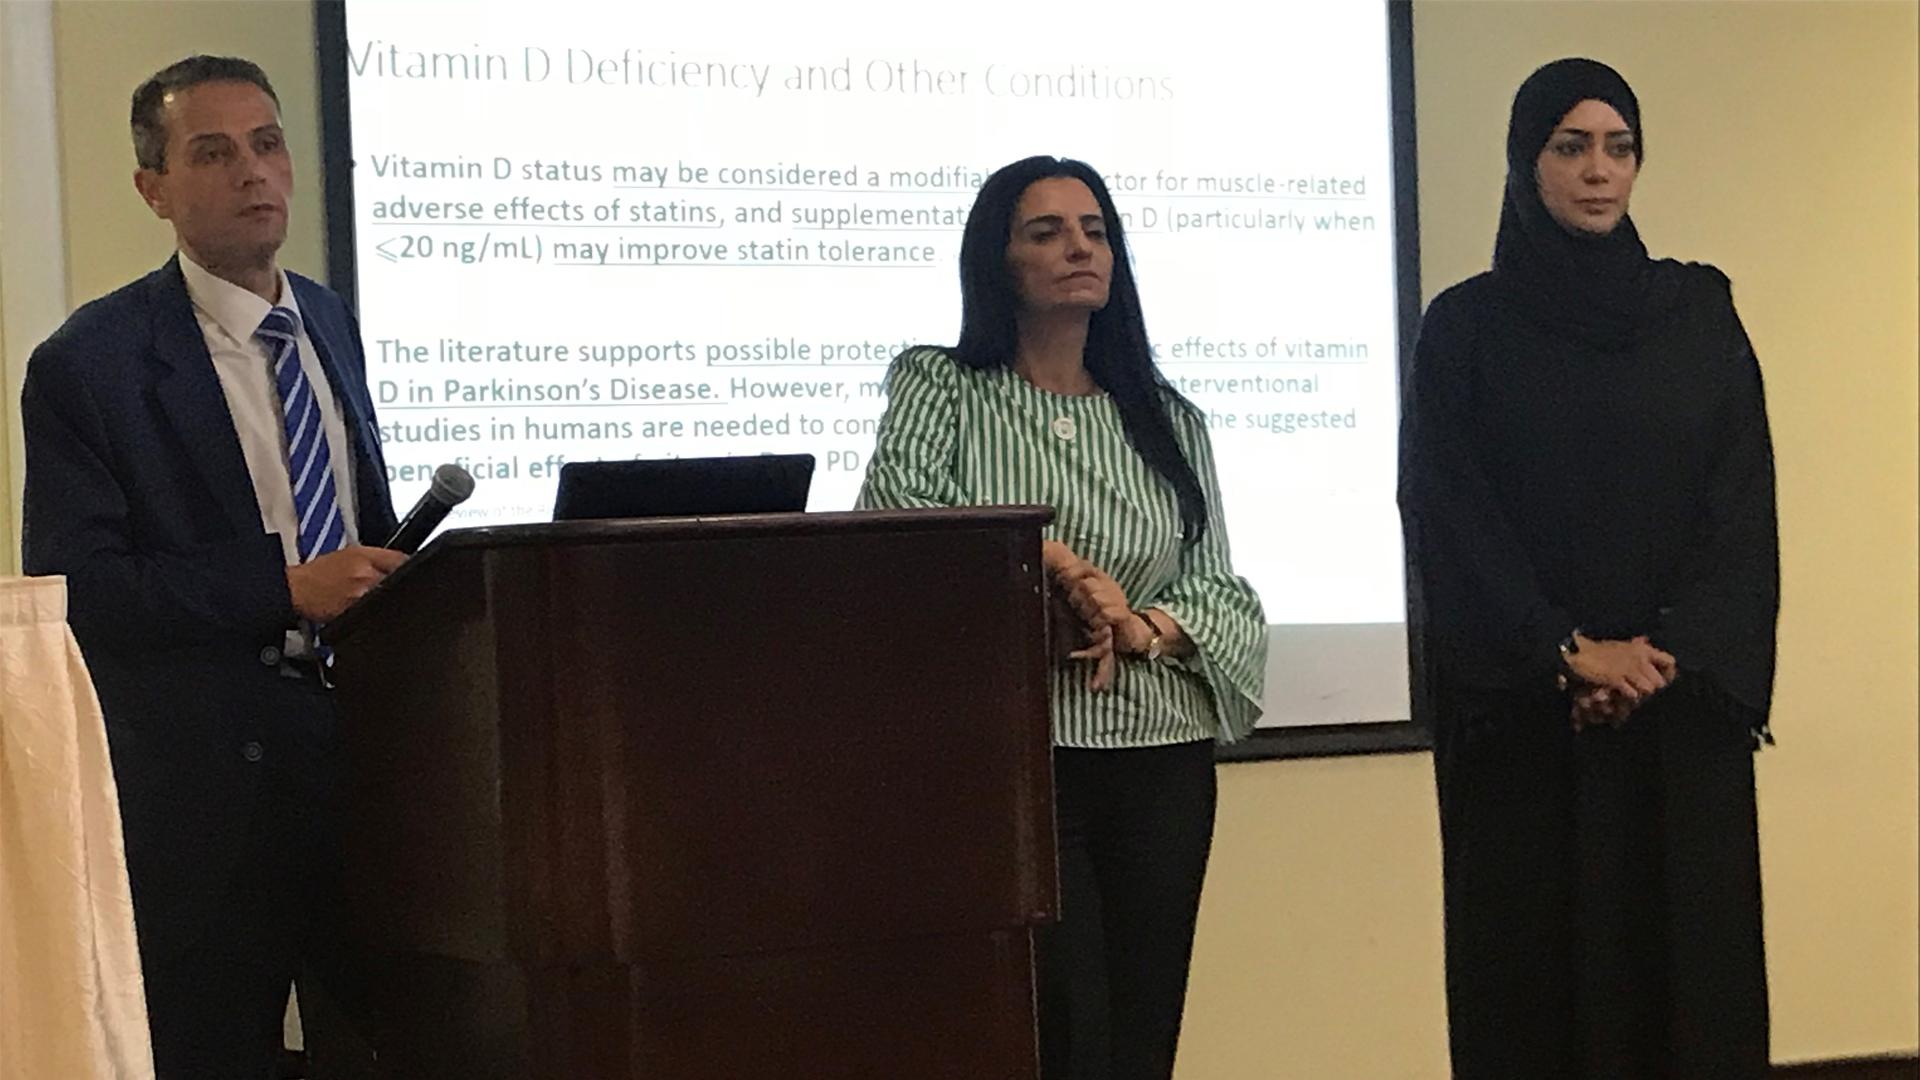 UAE's Vitamin D Deficiency Takes Center Stage in Scientific Seminar